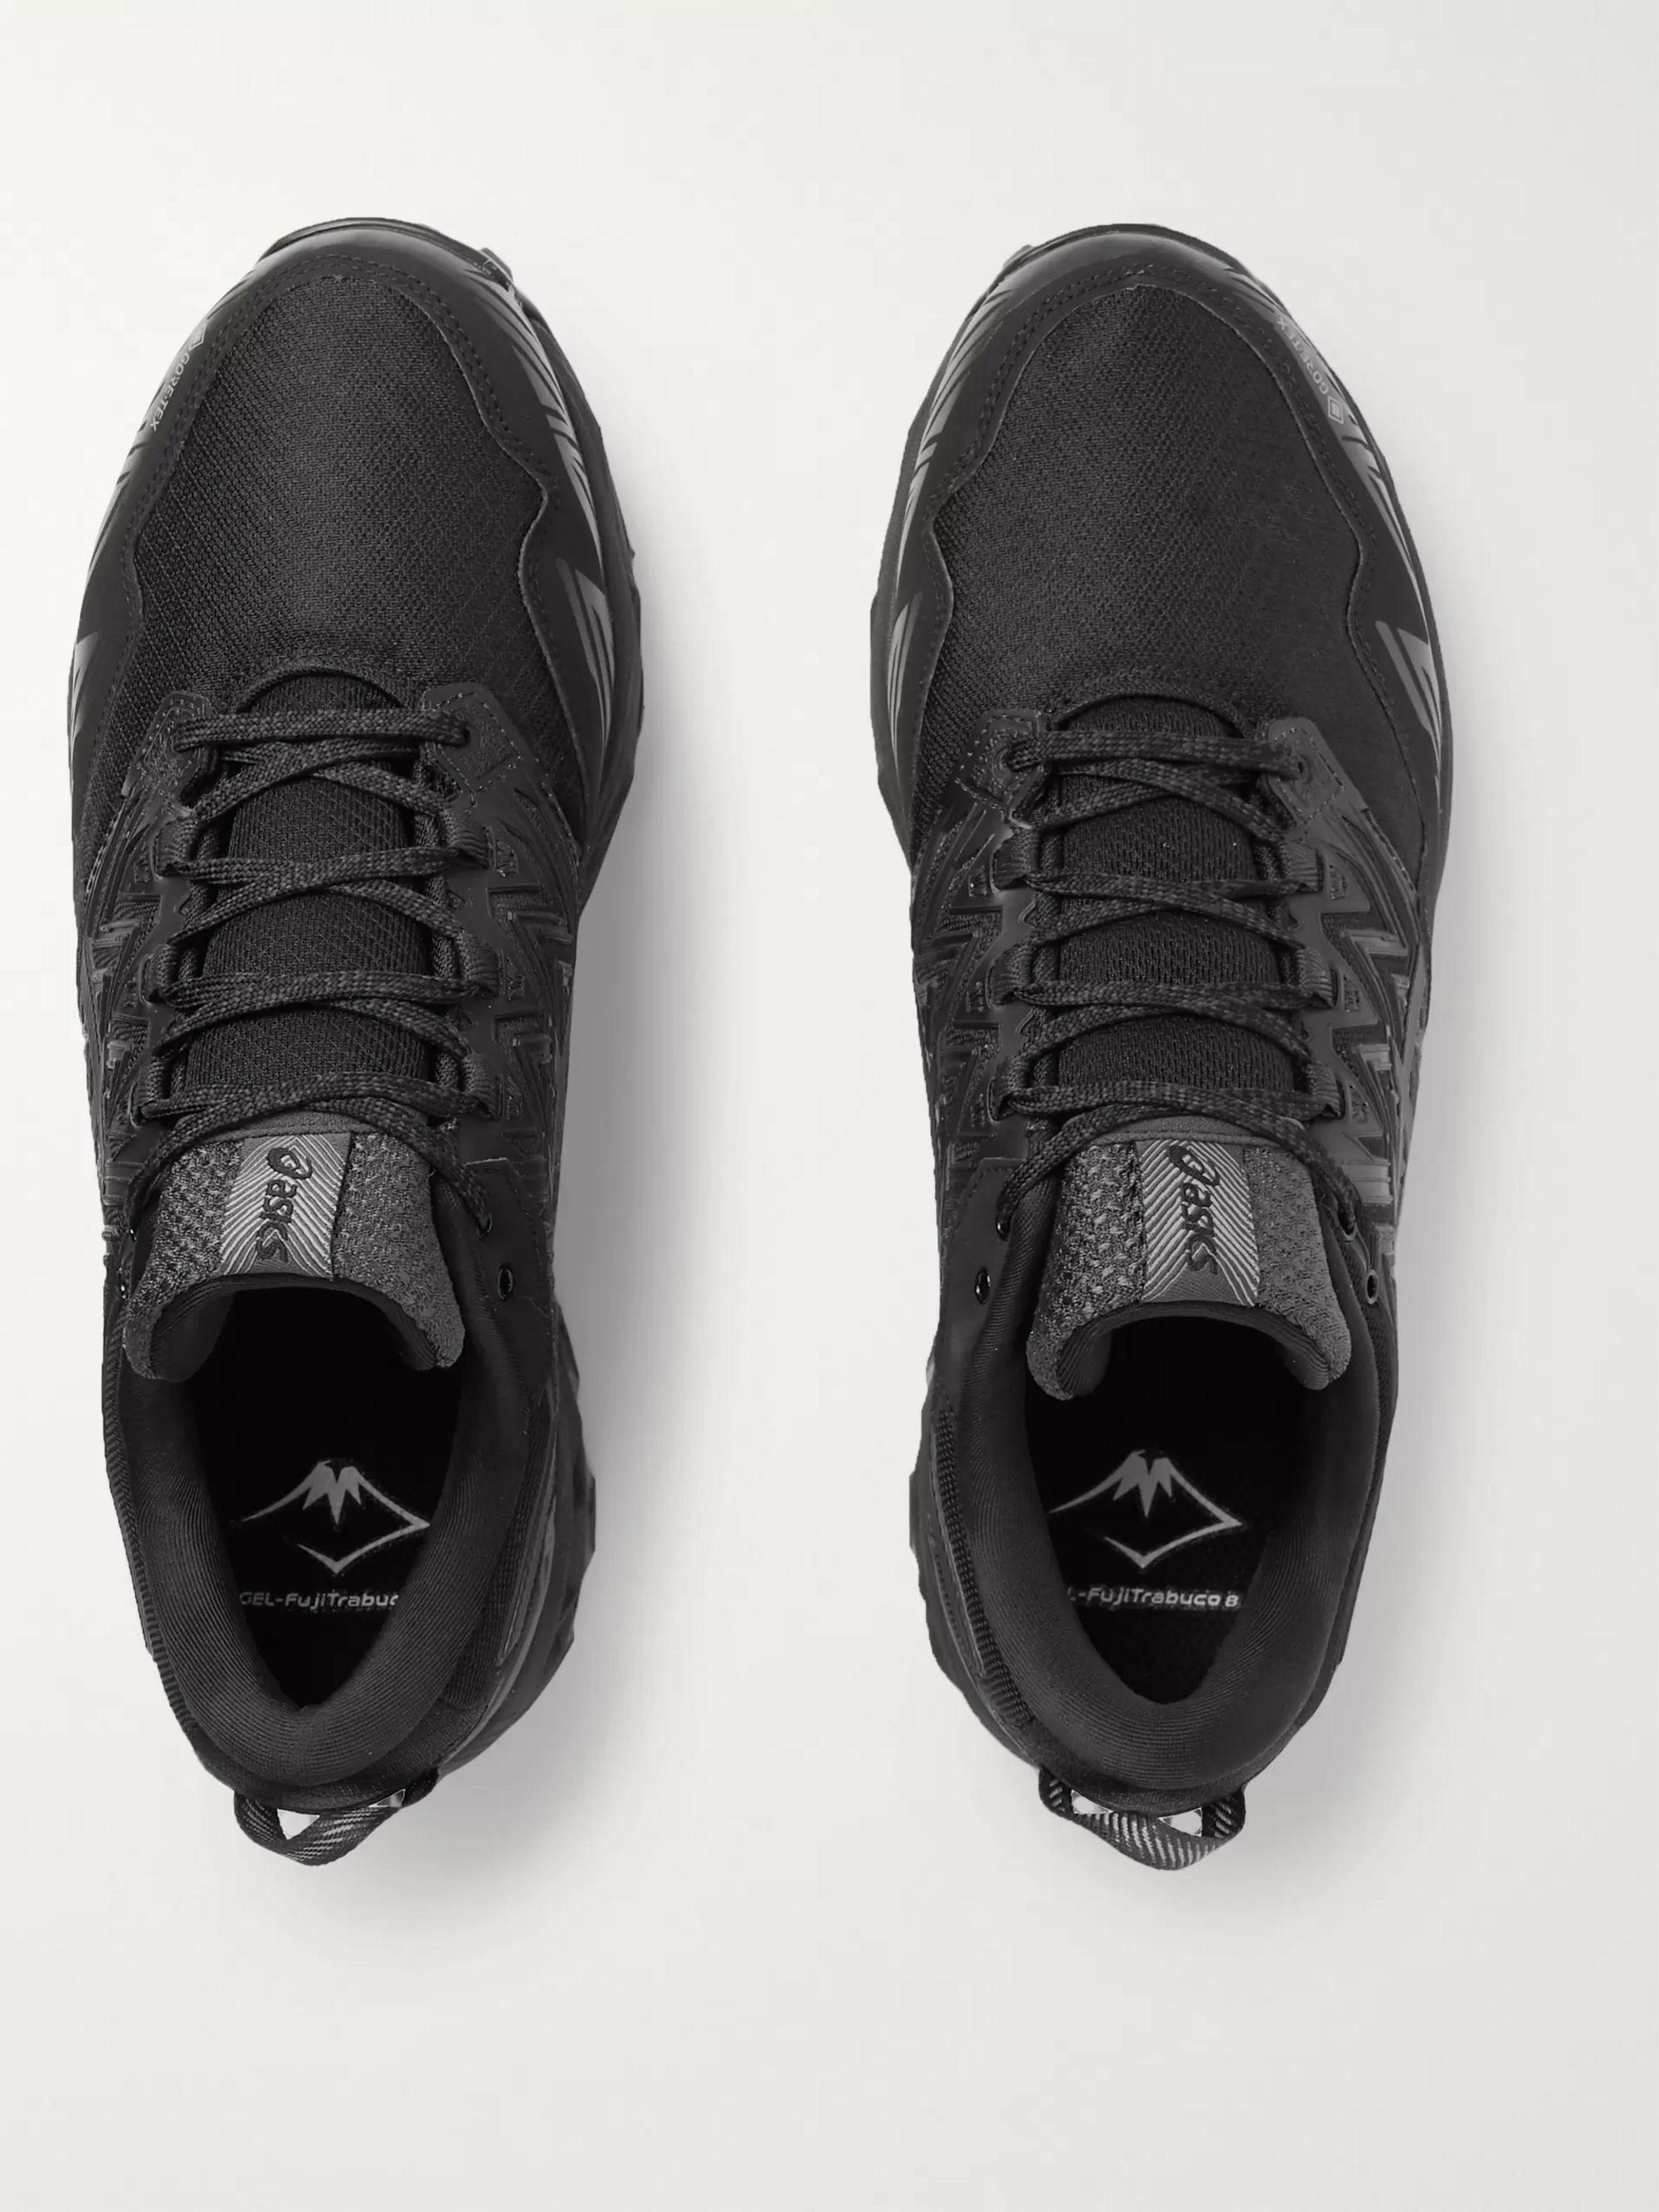 GEL FUJITRABUCO 8 G TX GORE TEX Ripstop and Rubber Sneakers